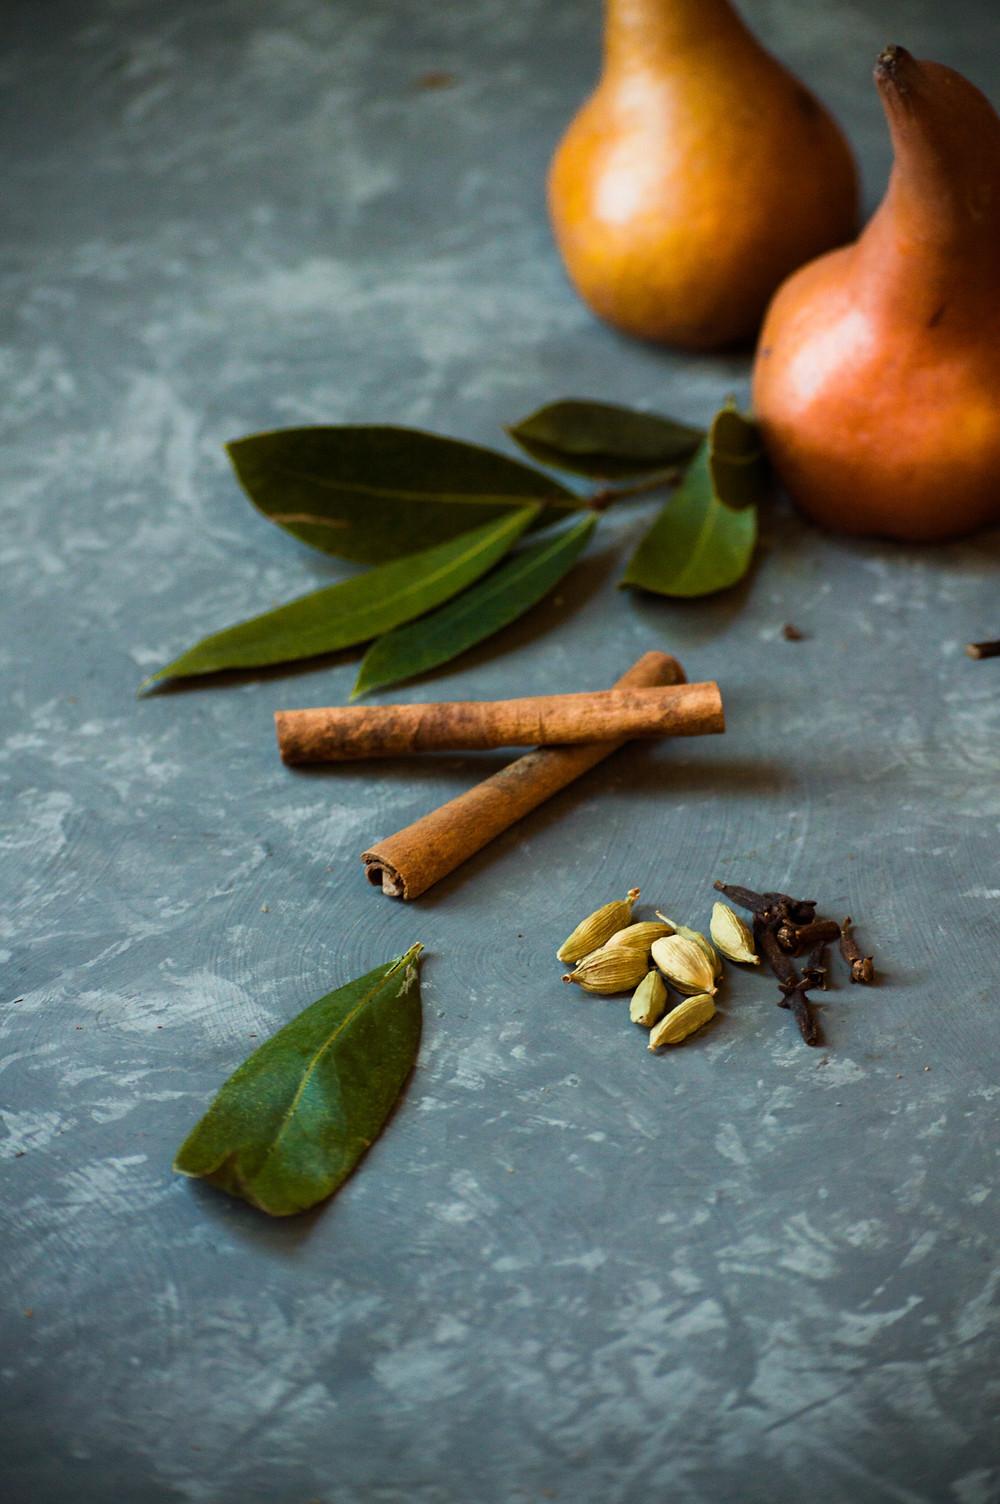 Pears, bay leaf, cinnamon, cardamon, food photography, Organic Kitchen Gardens